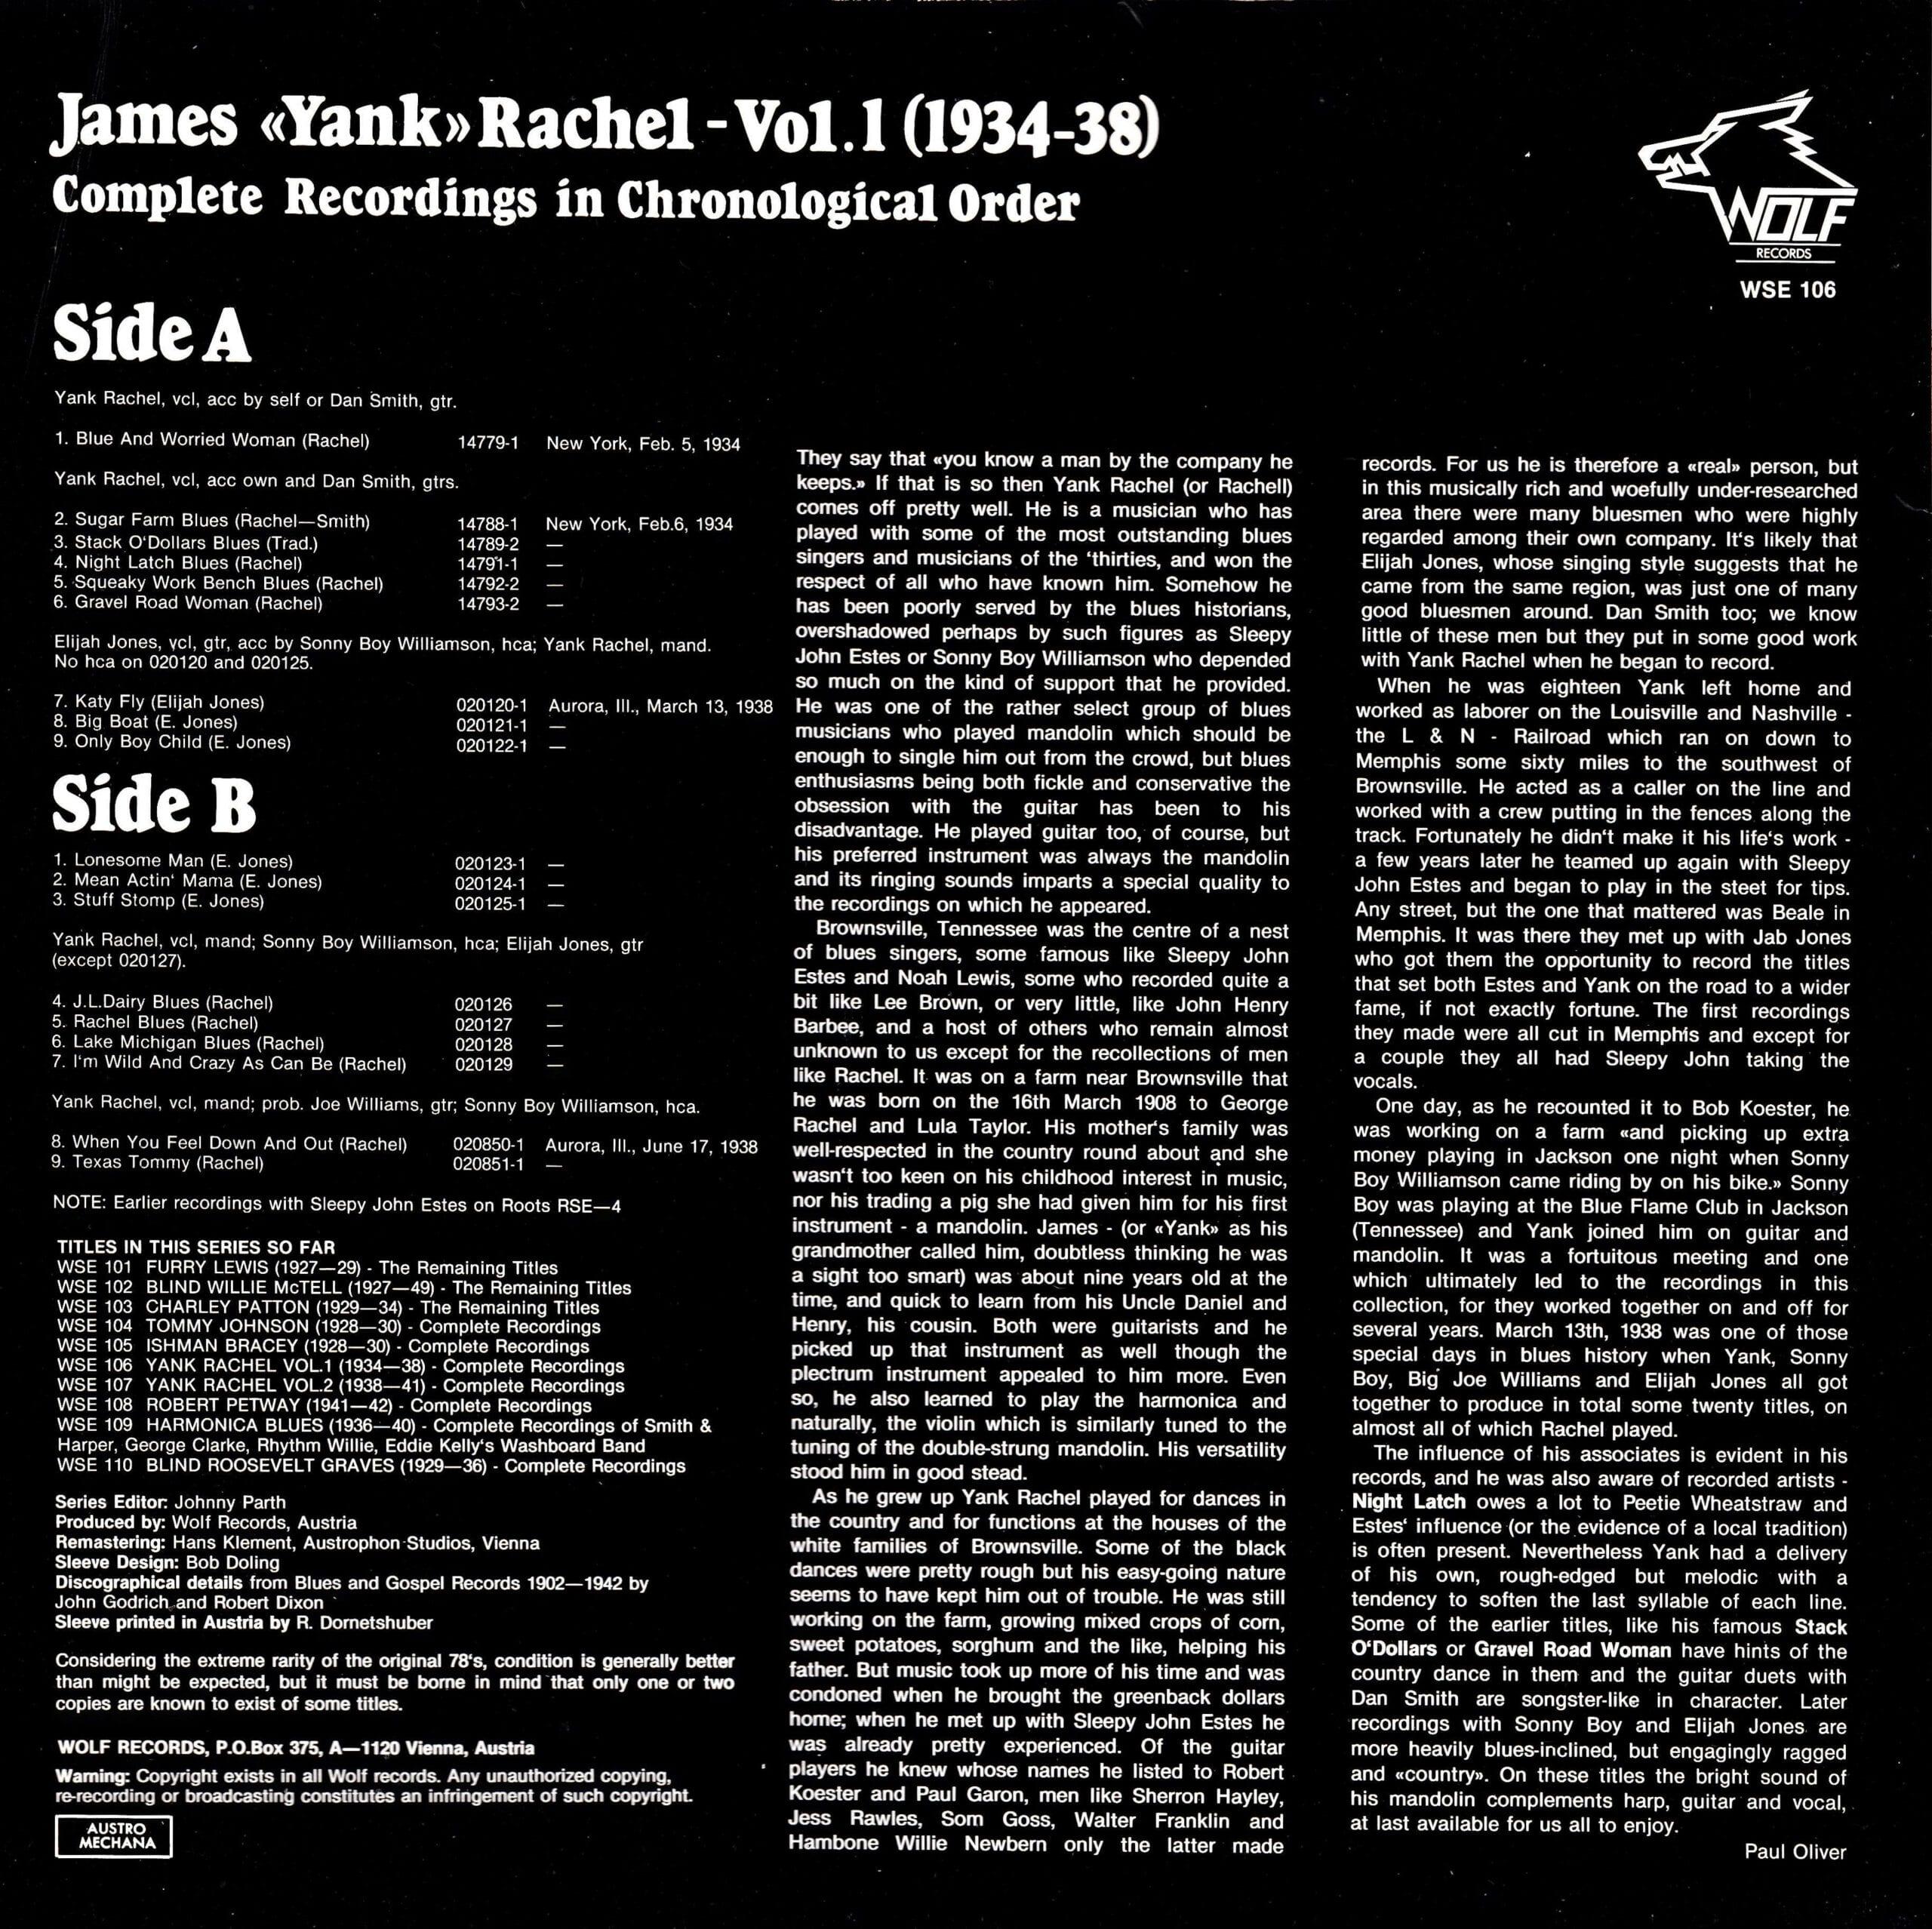 James Yank Rachel, Vol. 1 – 2